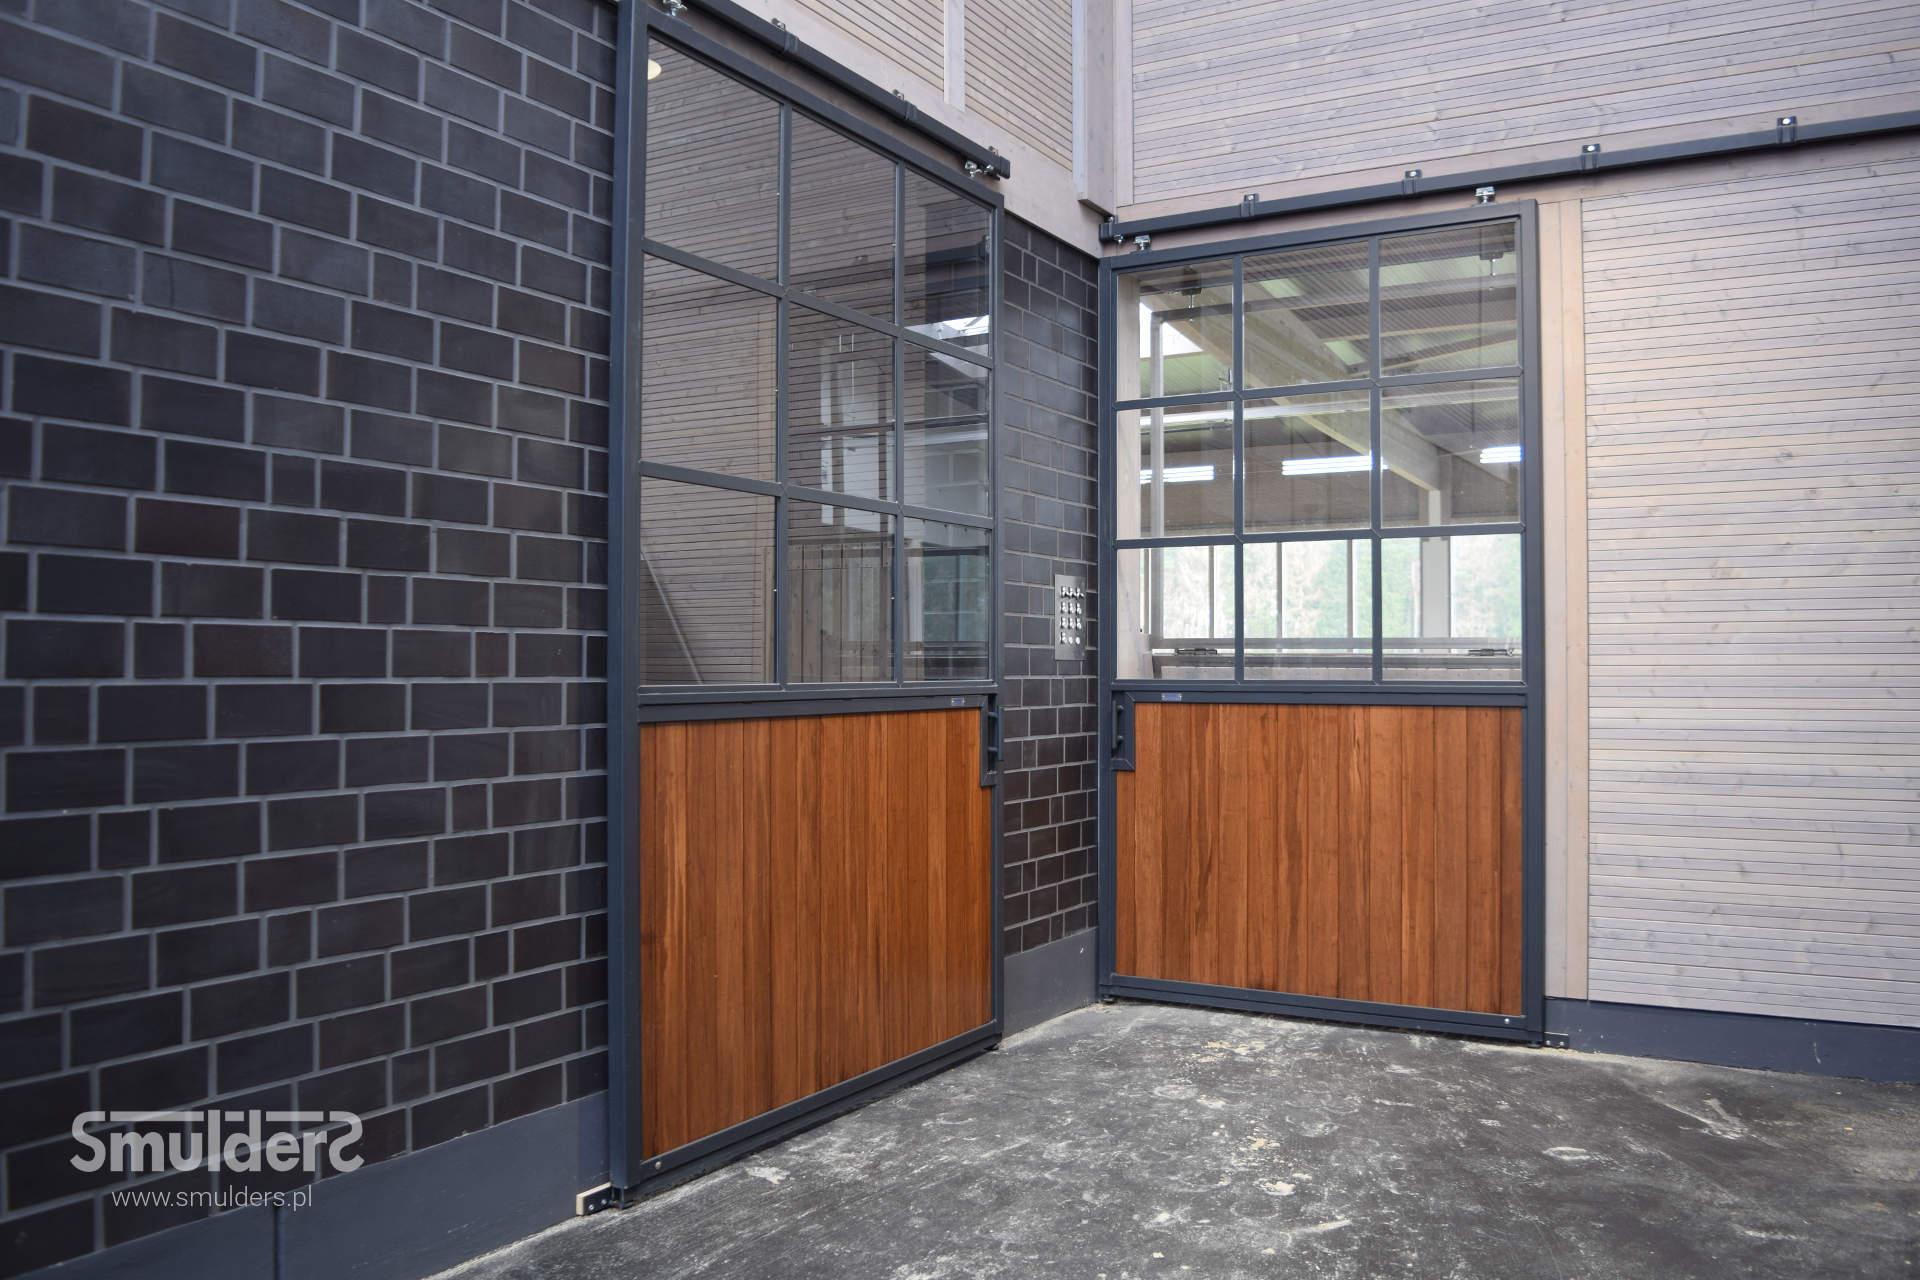 http://www.smulders.pl/wp-content/uploads/2019/06/f003_barn-doors_IMM_SMULDERS_PL.jpg